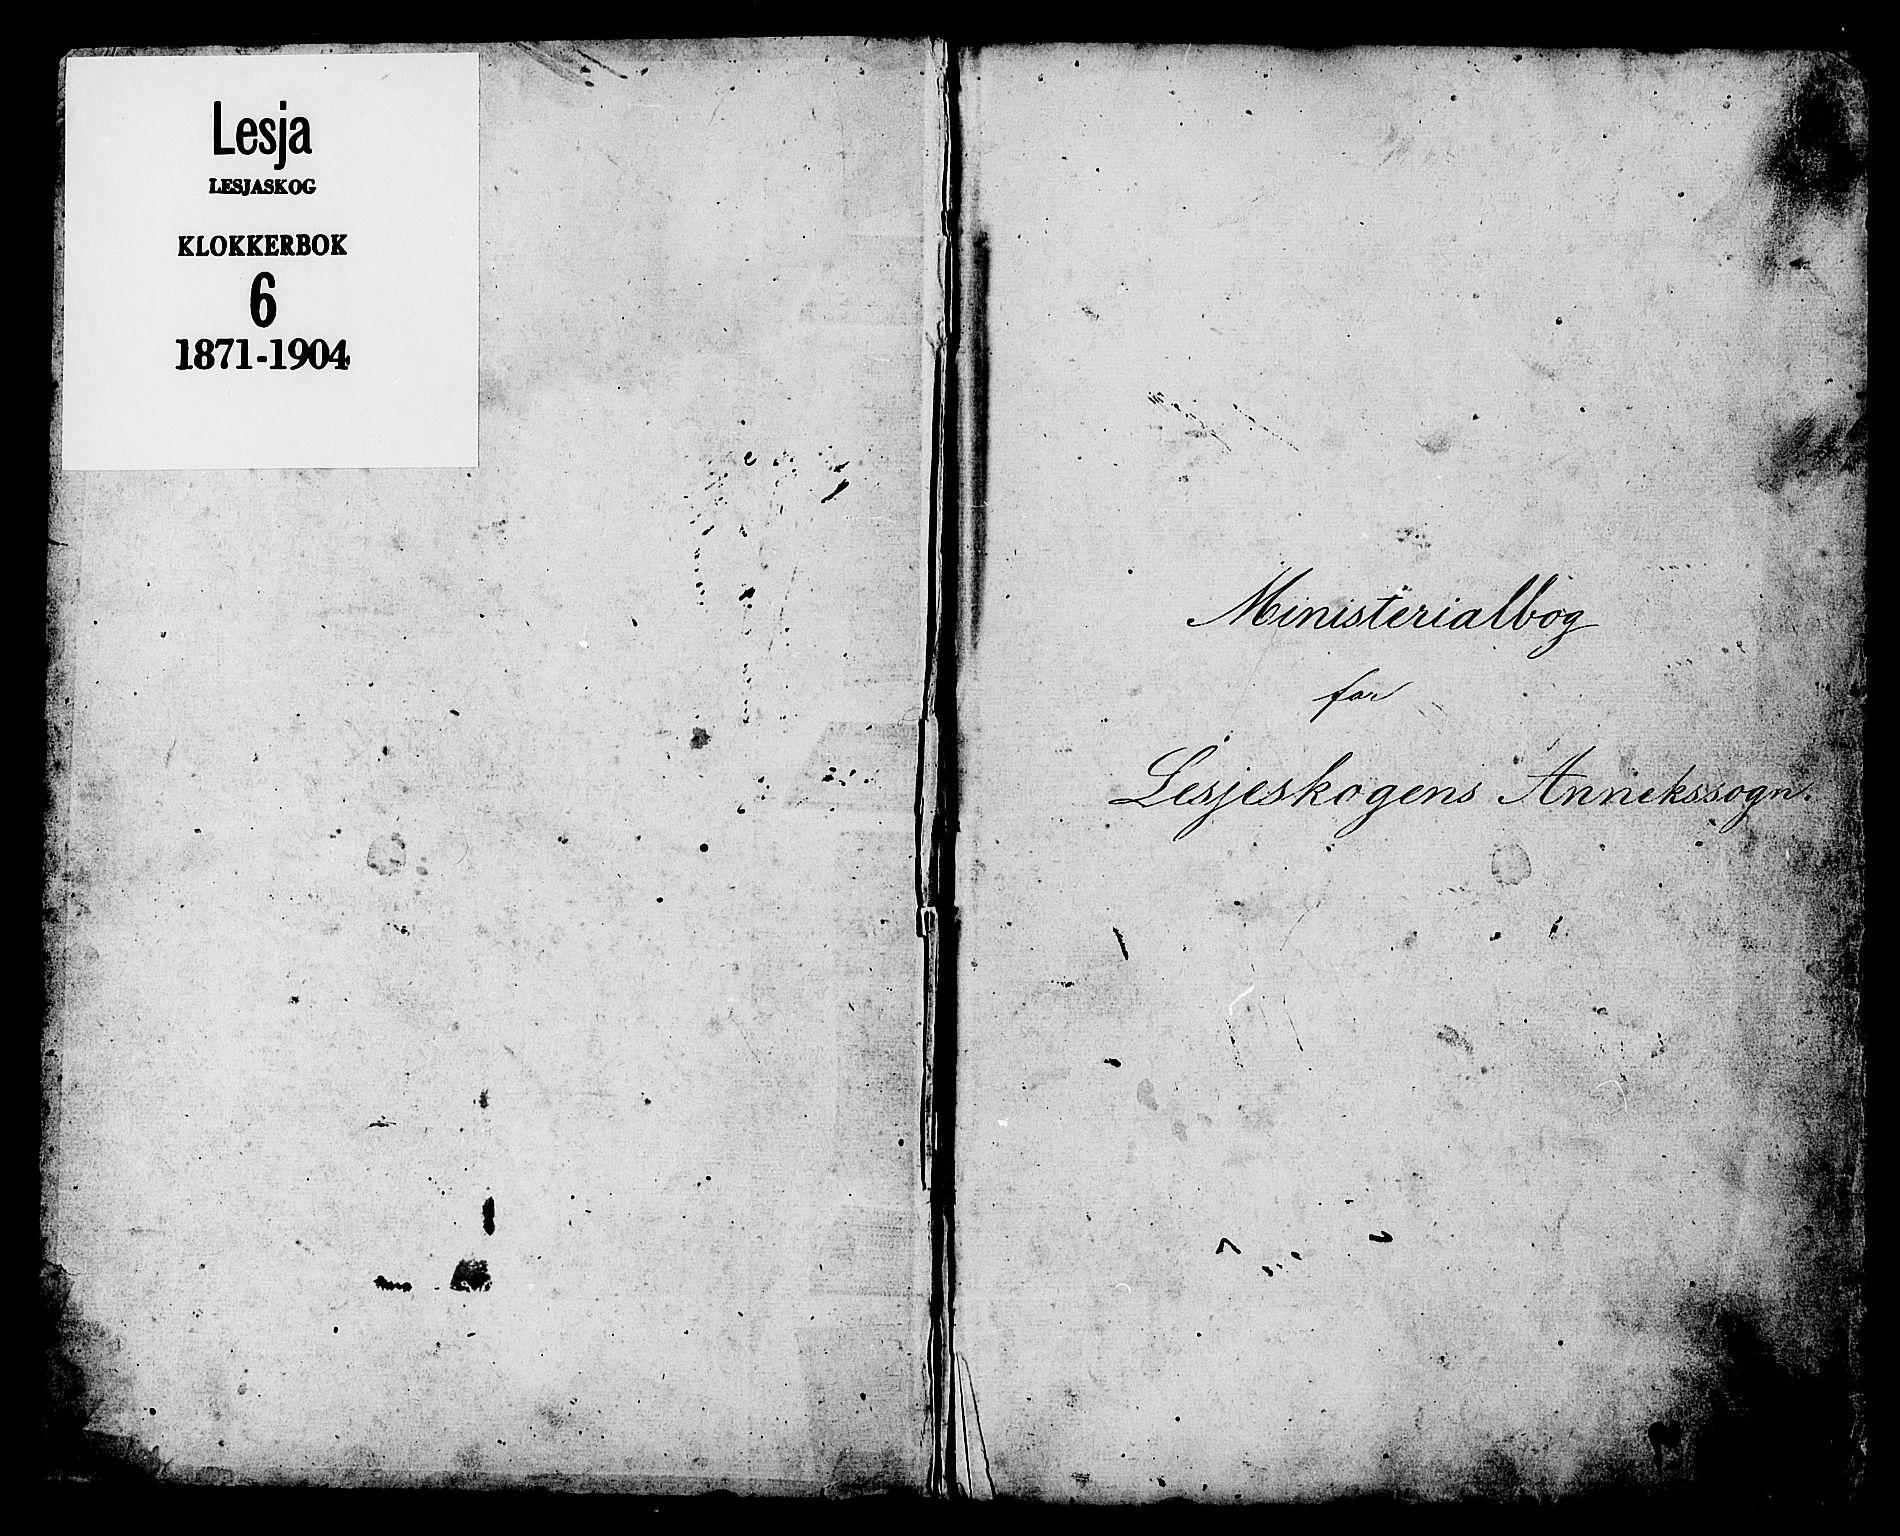 SAH, Lesja prestekontor, Klokkerbok nr. 6, 1871-1904